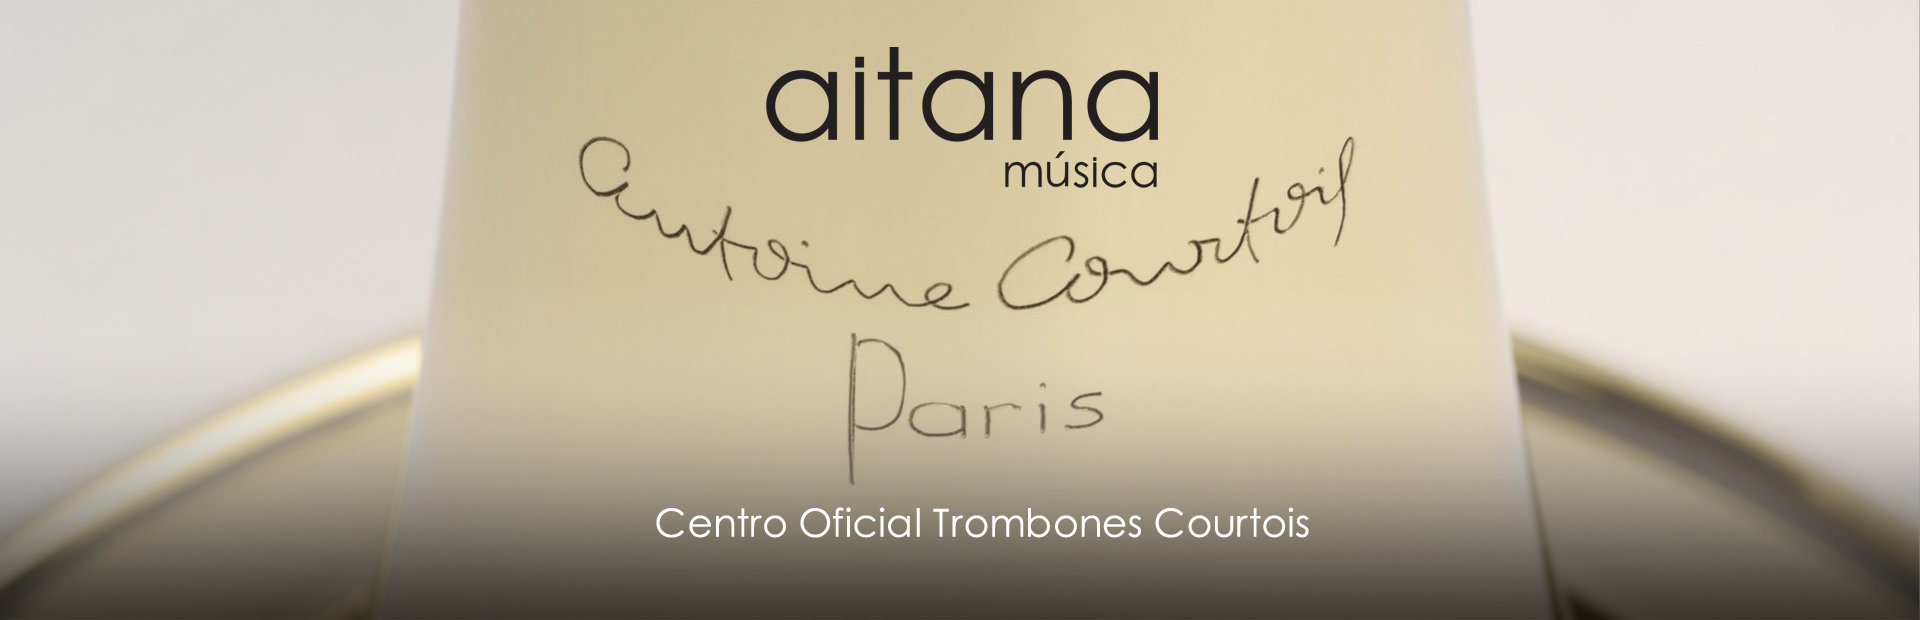 banner-trombones-courtois